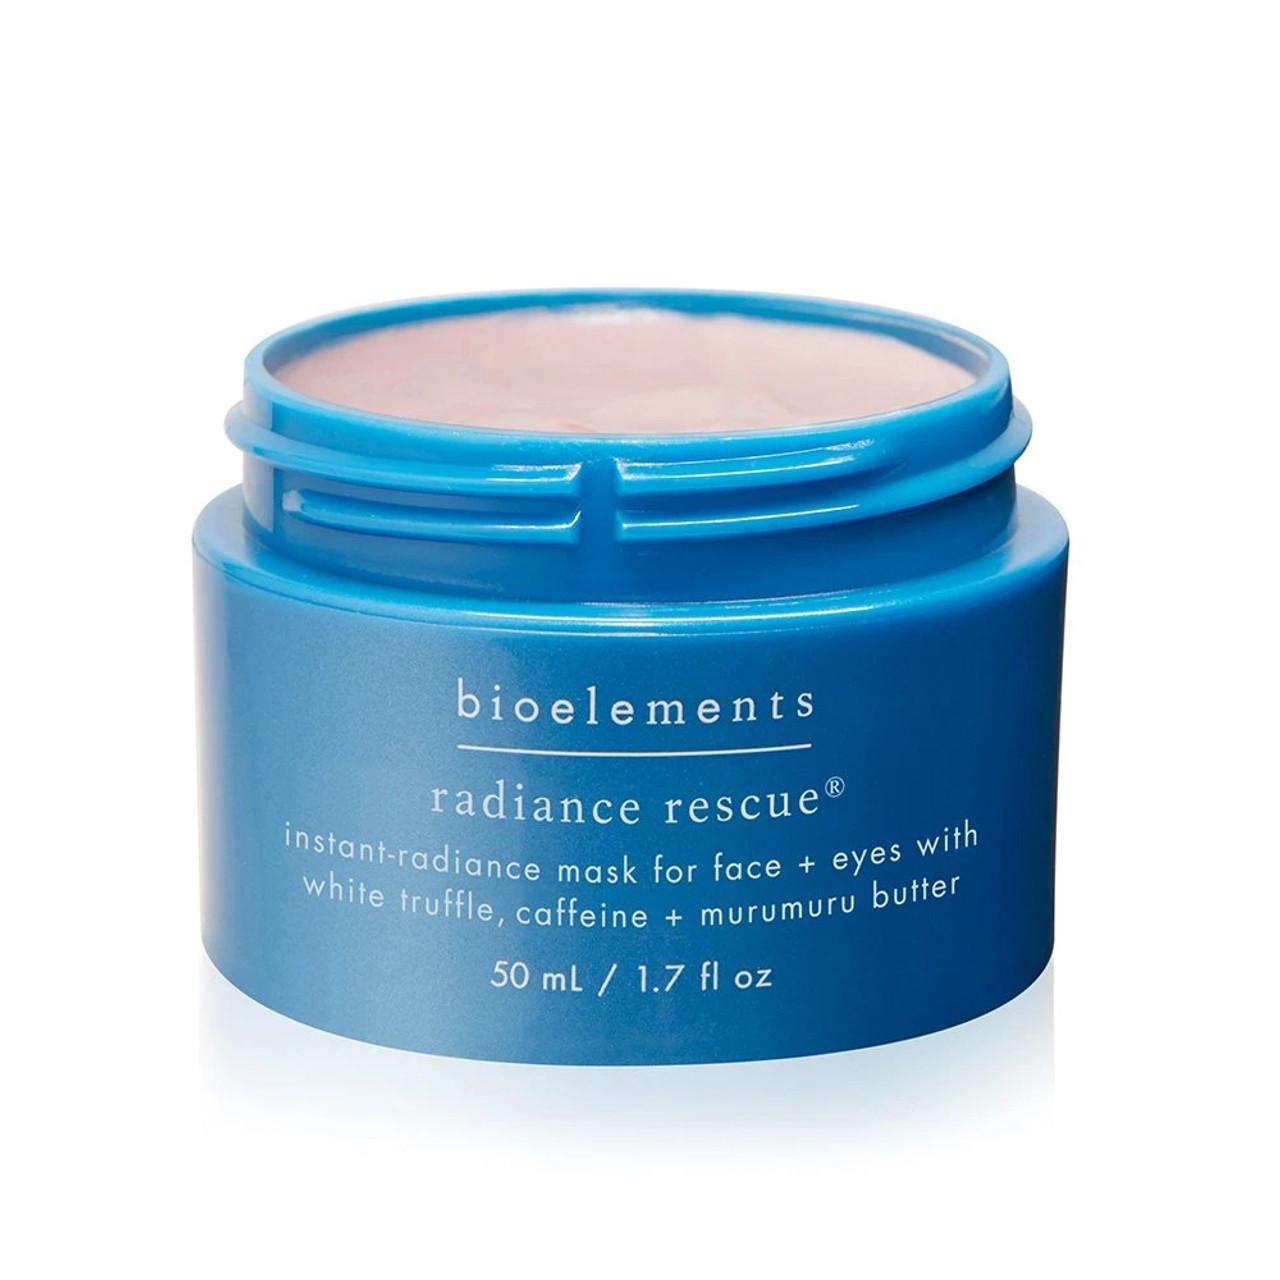 Bioelements Radiance Rescue